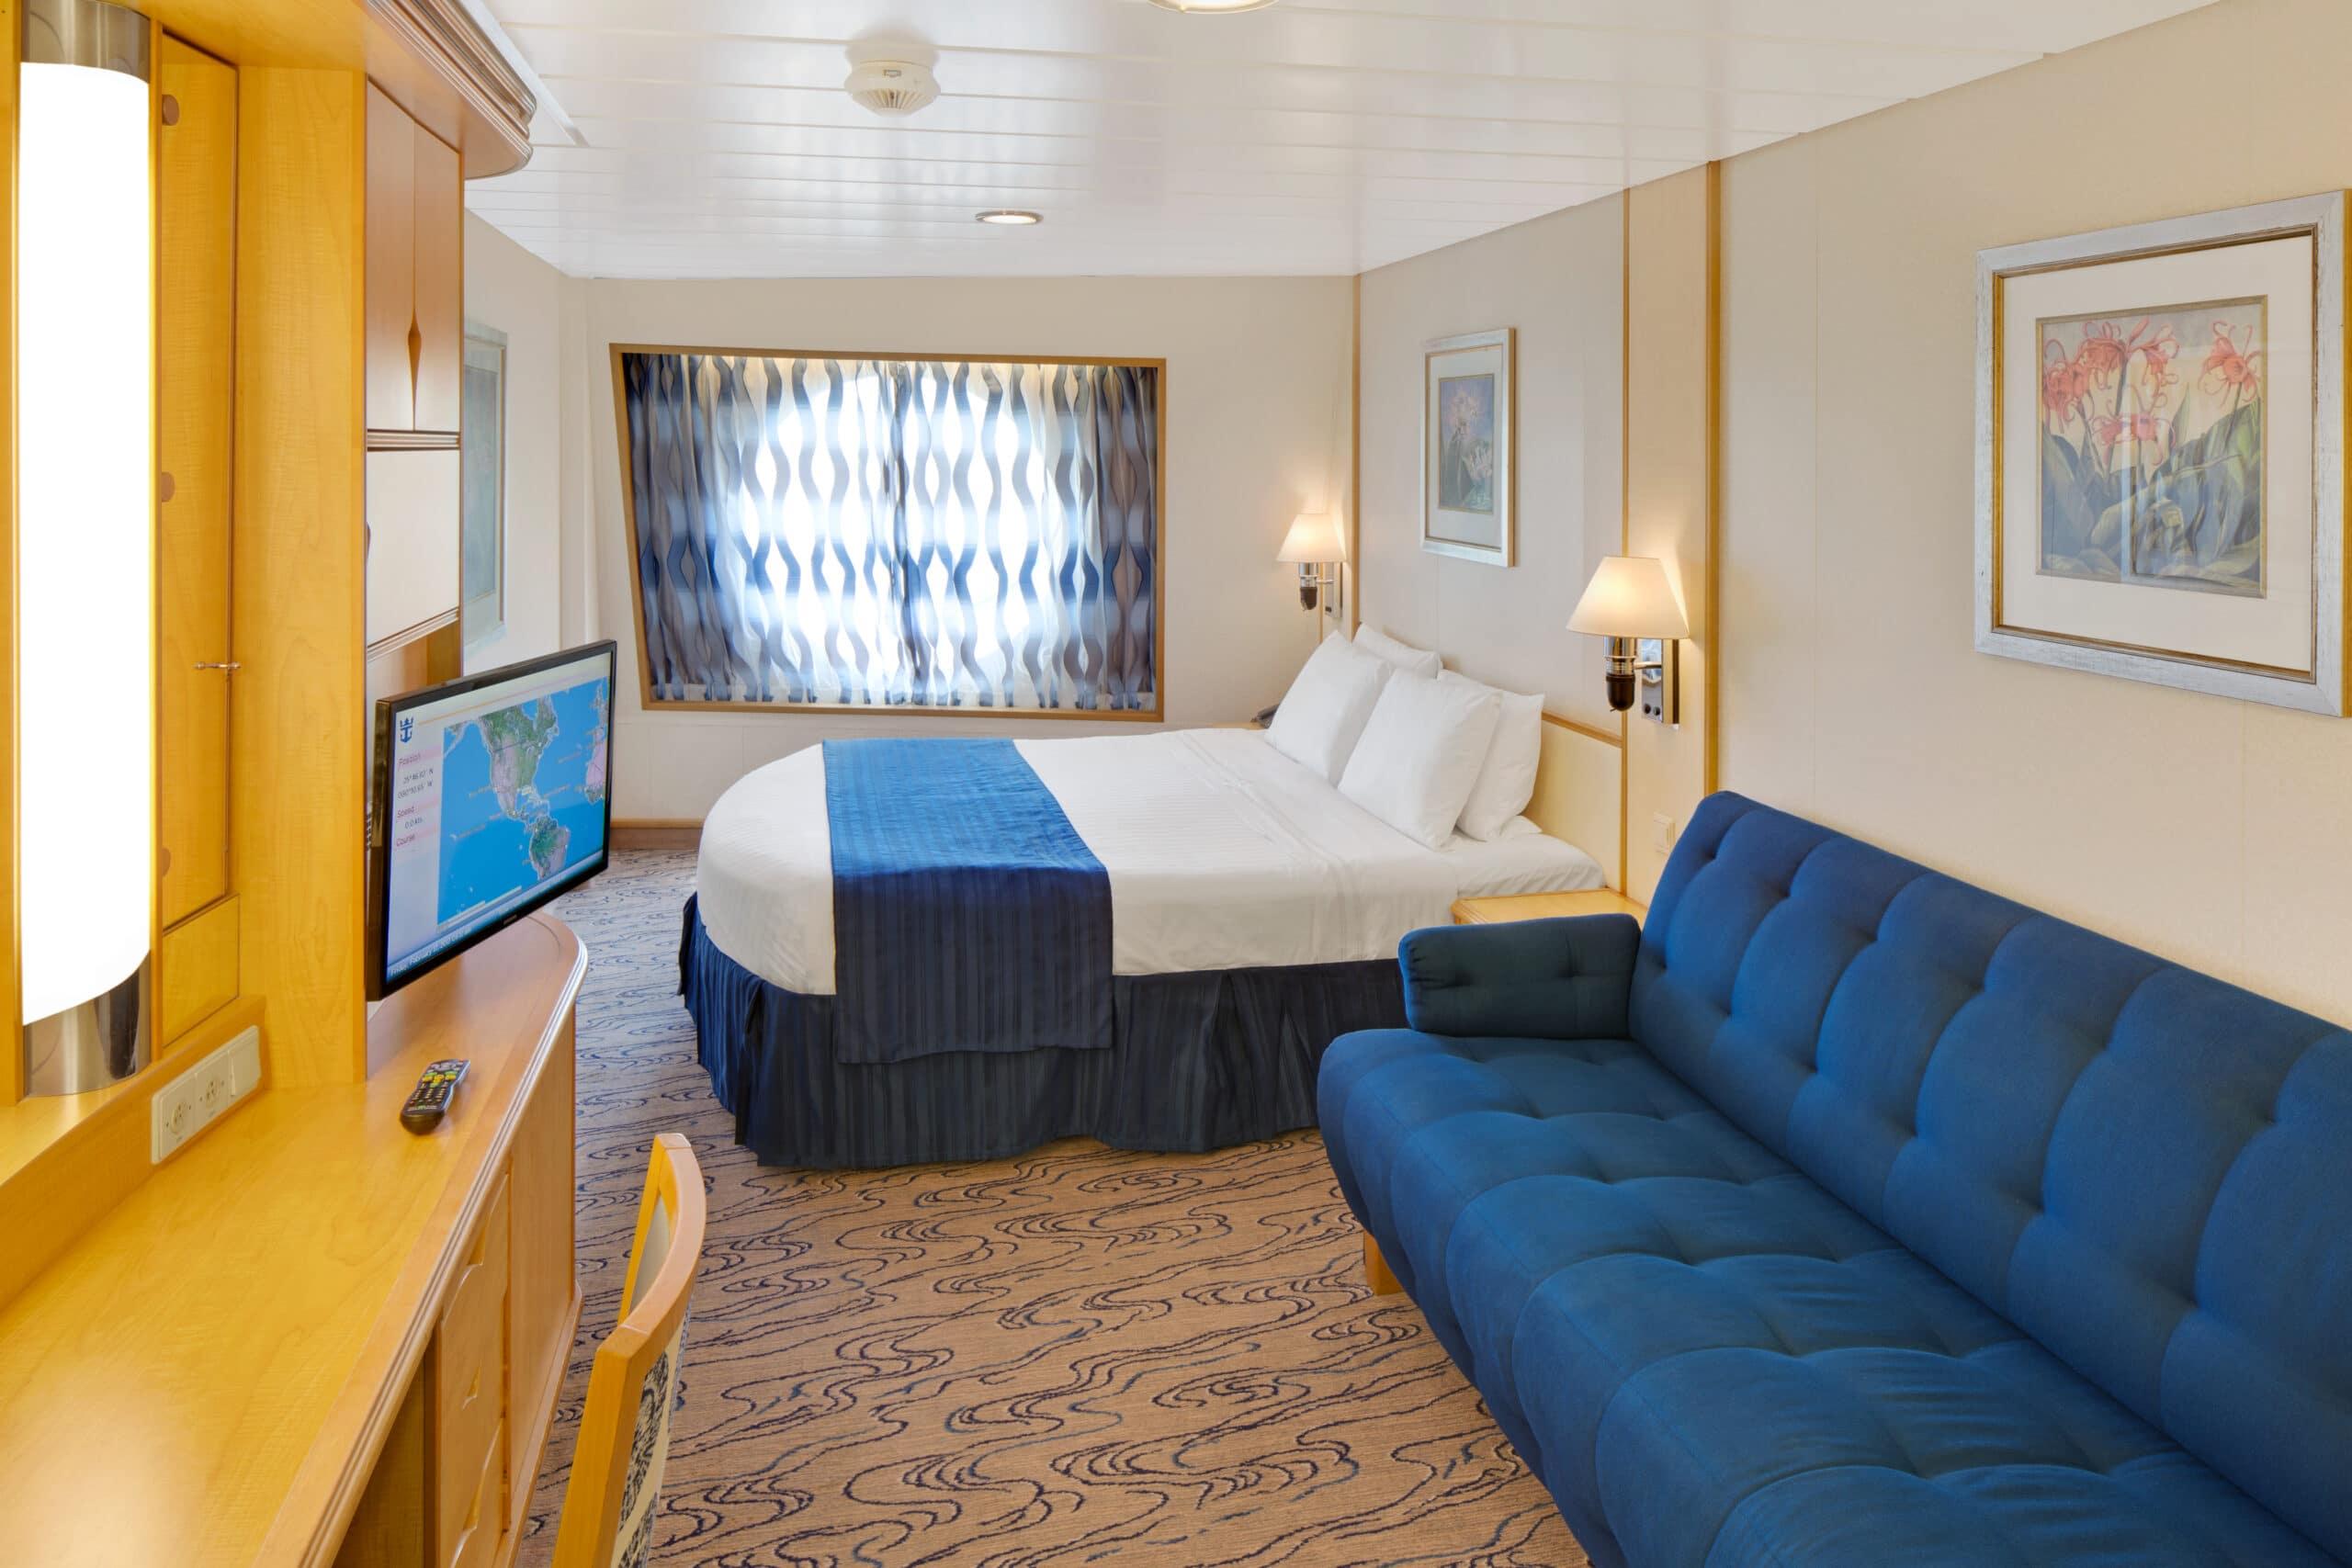 Royal-Caribbean-International-Navigator-of-the-Seas-Voyager-of-the-Seas-schip-cruiseschip-categorie-1M-4M-ruime-buitenhut